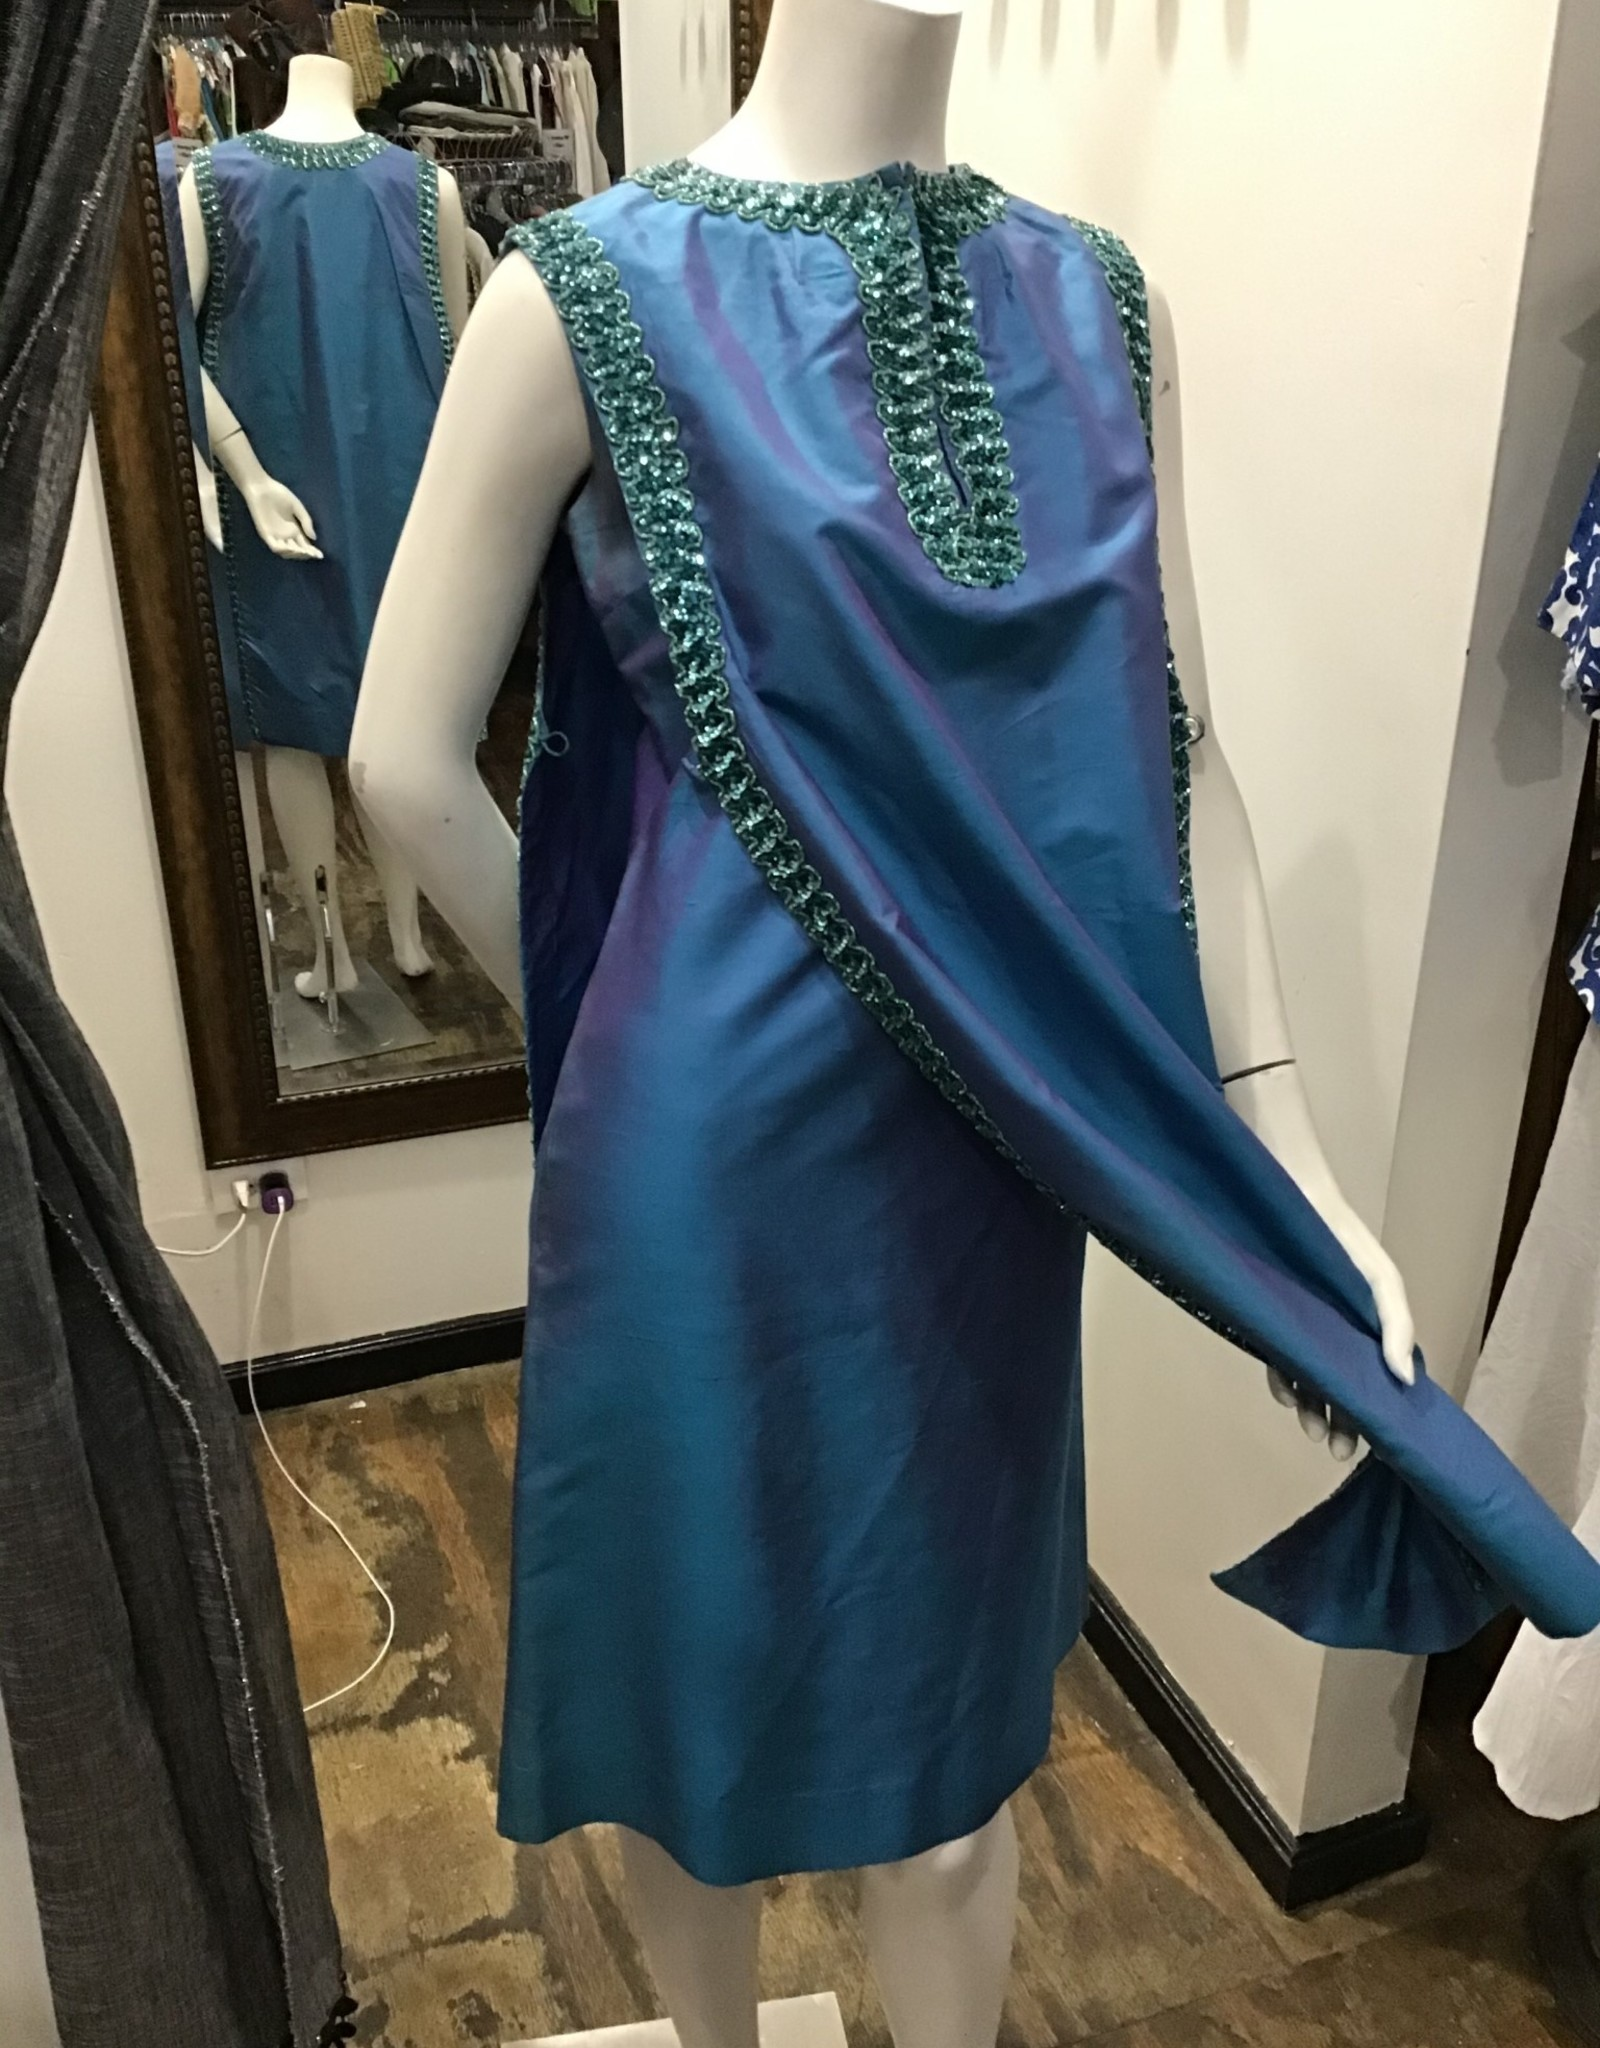 60's blue dress w/over cape w/sequins